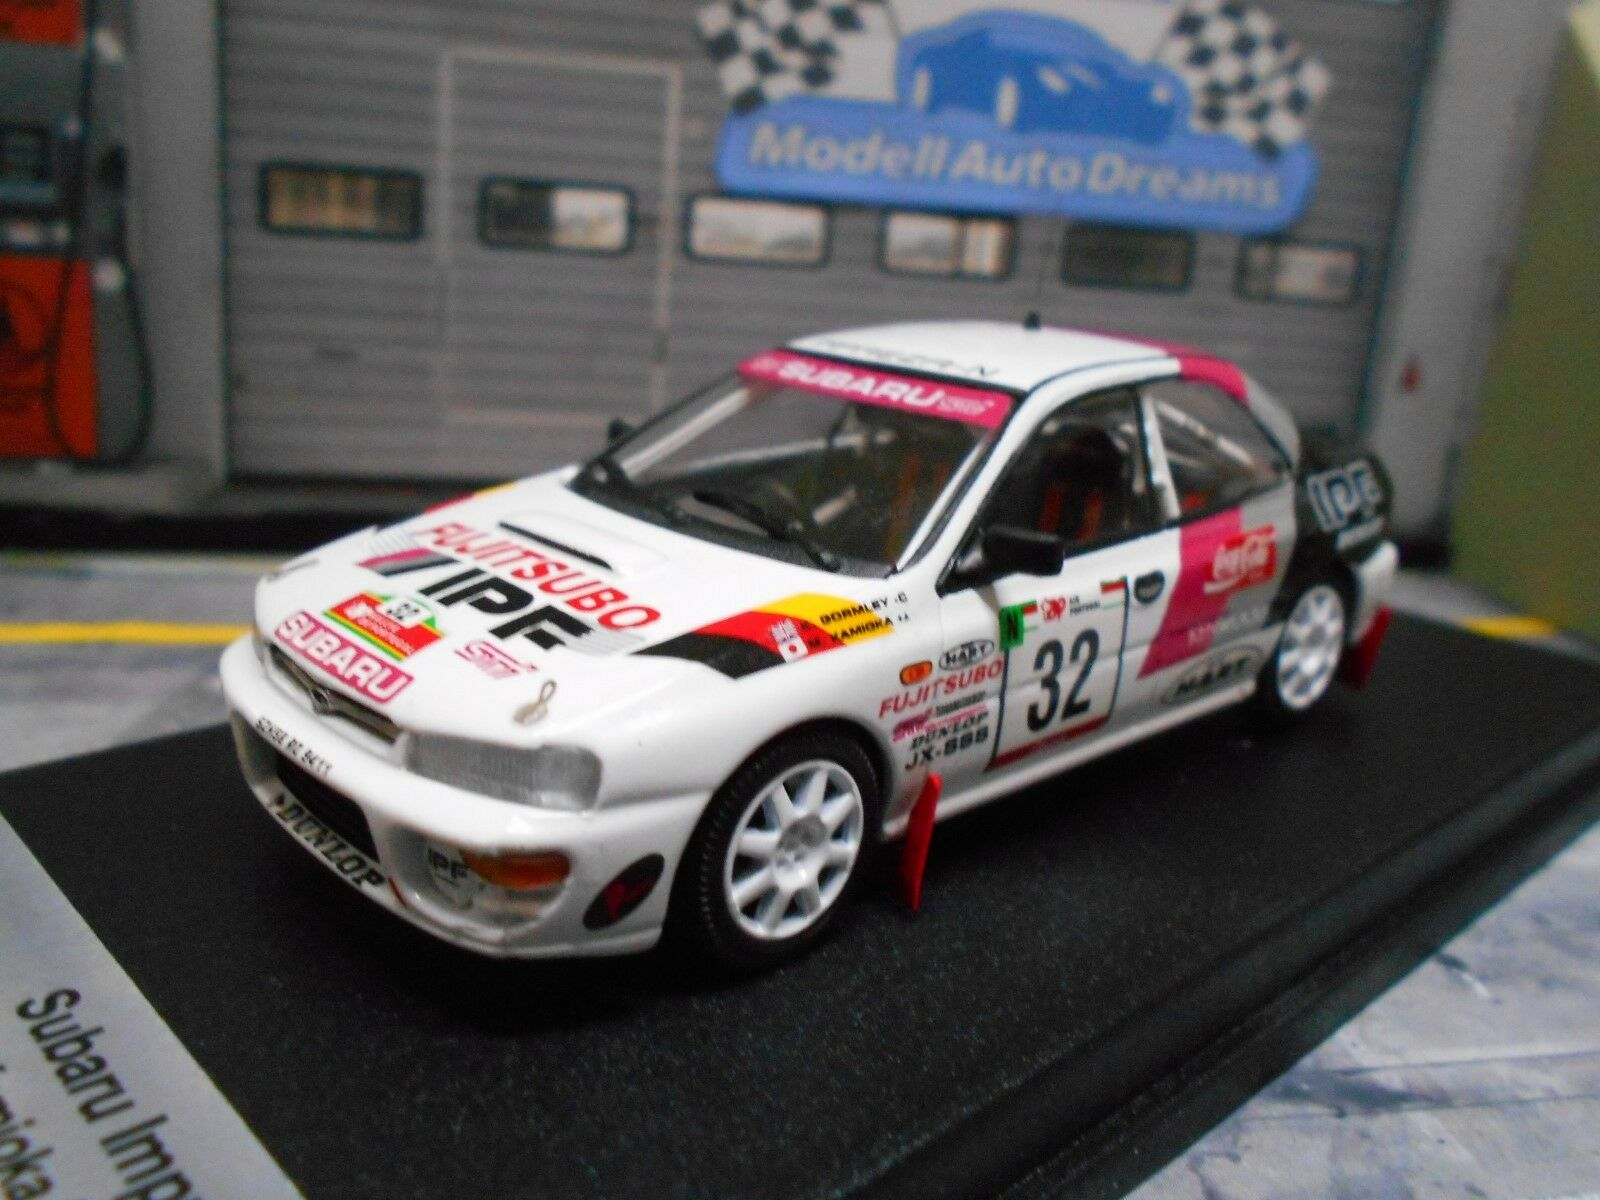 servicio considerado Subaru Impreza Impreza Impreza WRC Rally Portugal 1995 Kamioka  32 ipf Limited Trofeu 1 43  Garantía 100% de ajuste